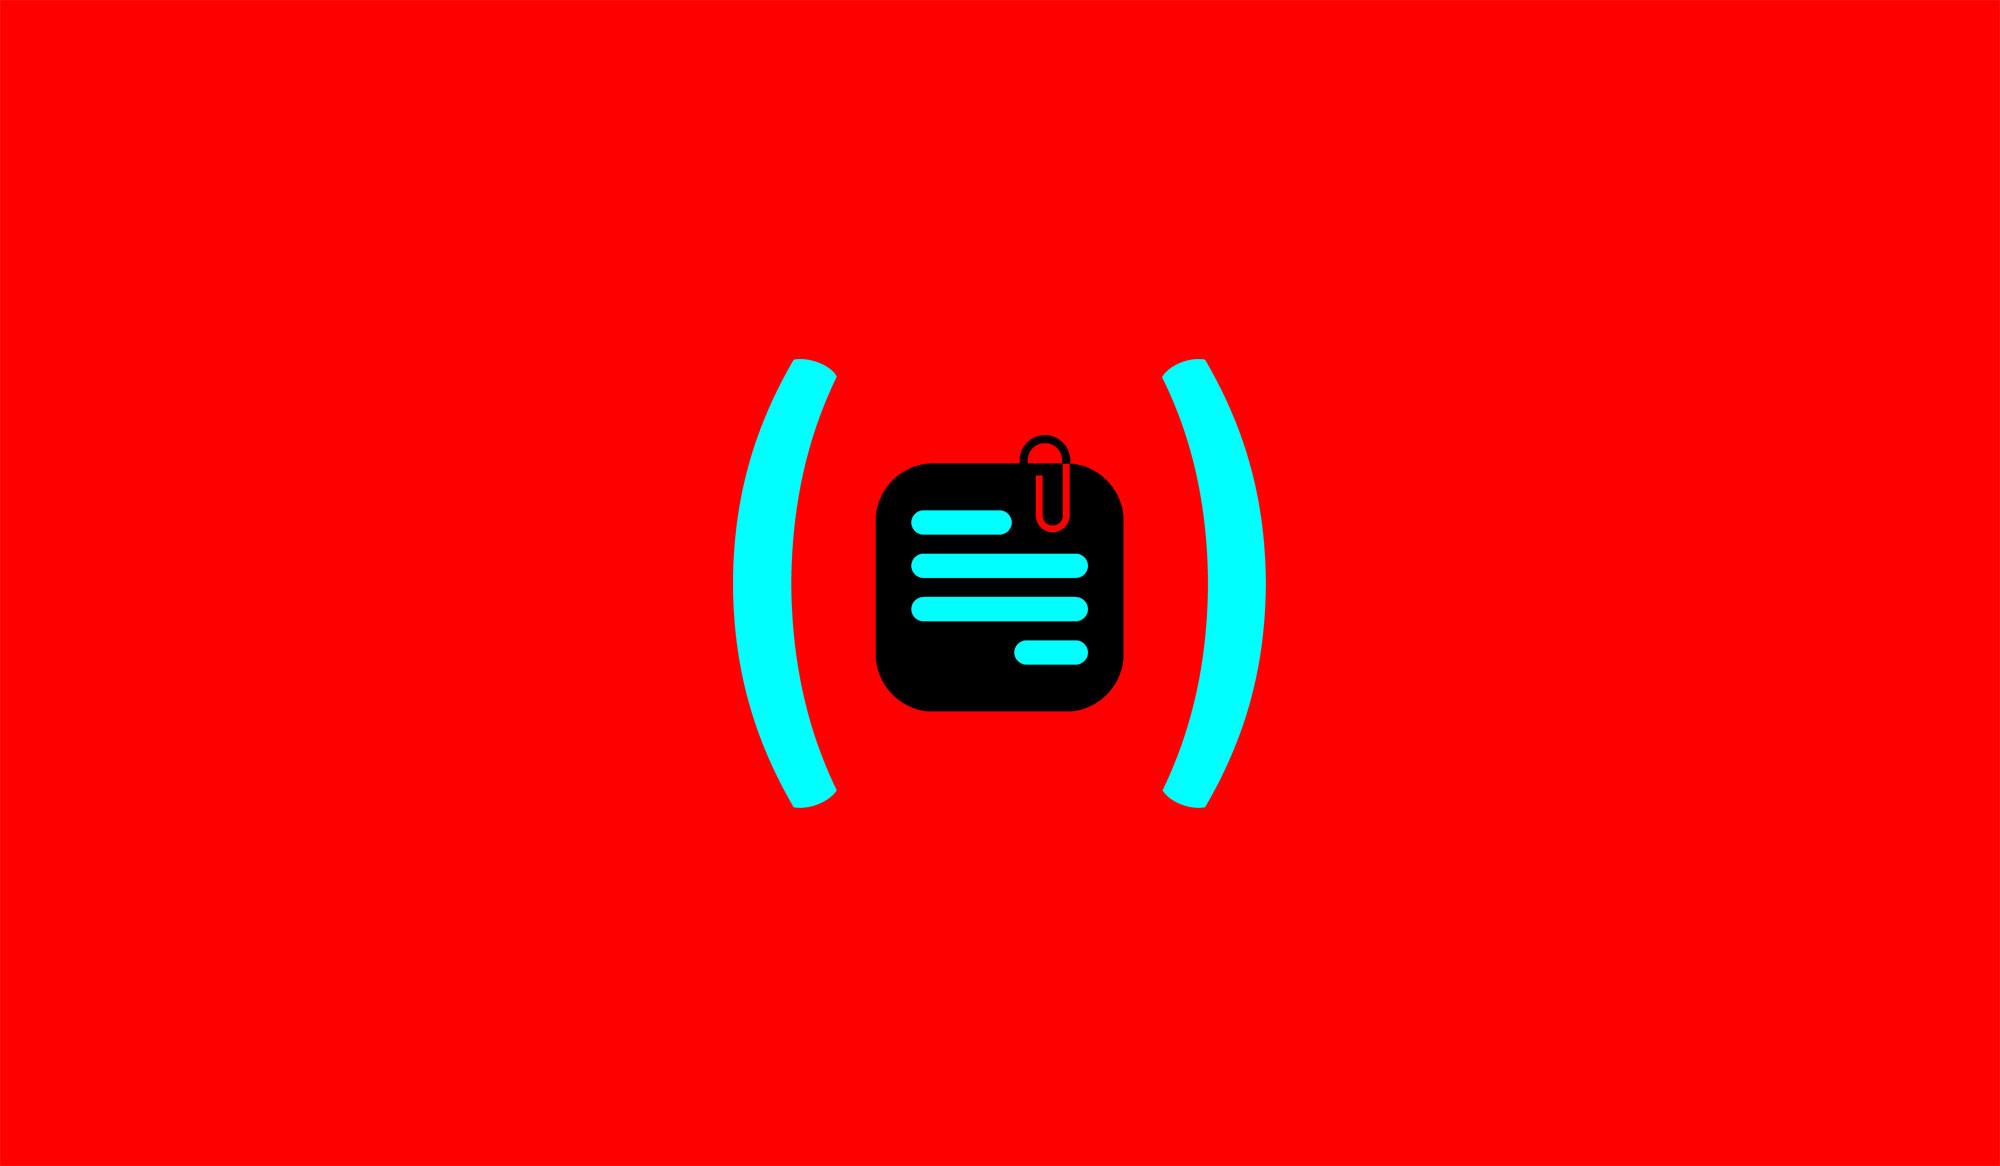 quentin_paquignon-branding-visual_identity-musi(x)™_07.png